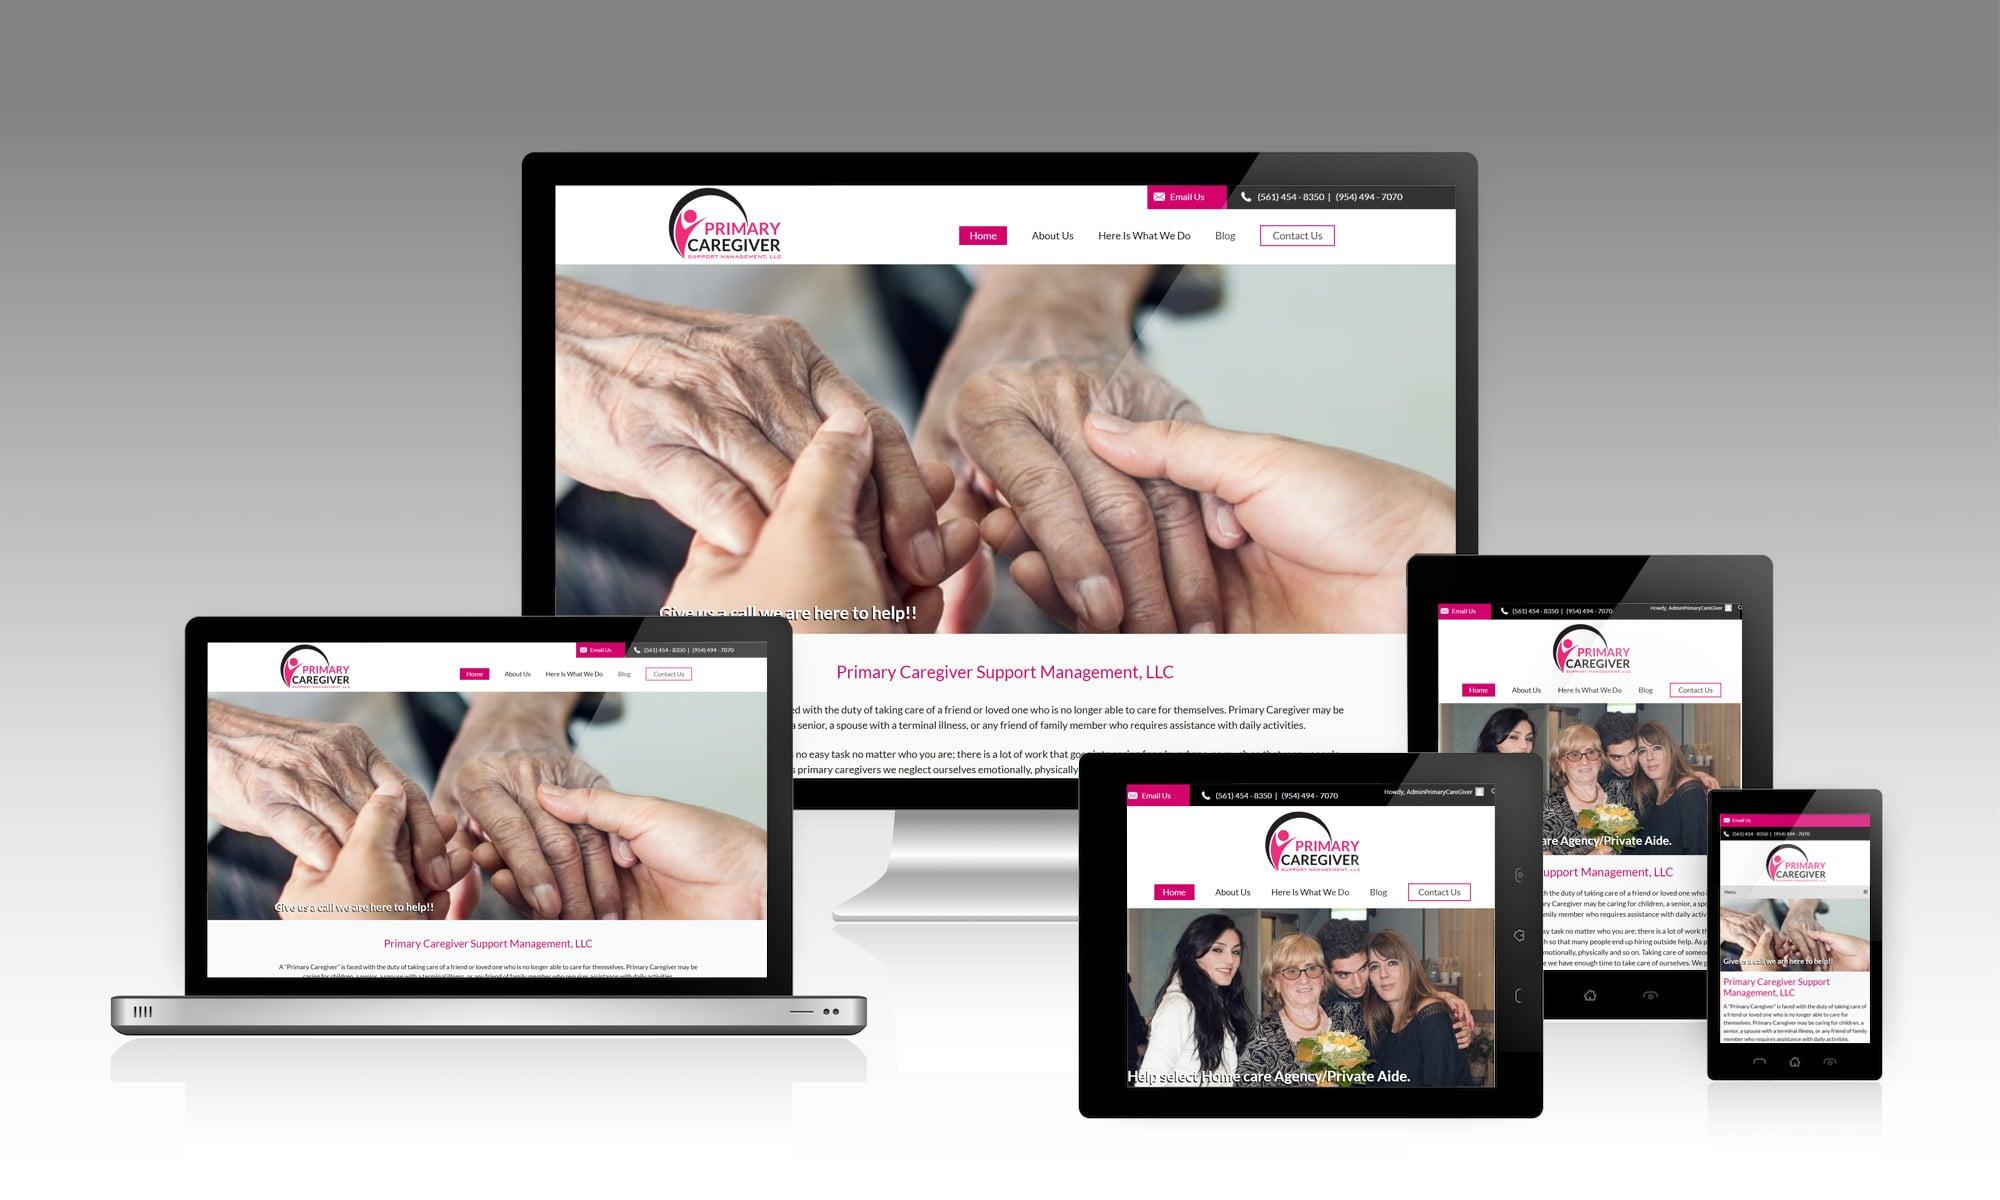 Primary Caregiver - Web Design and Development Presentation